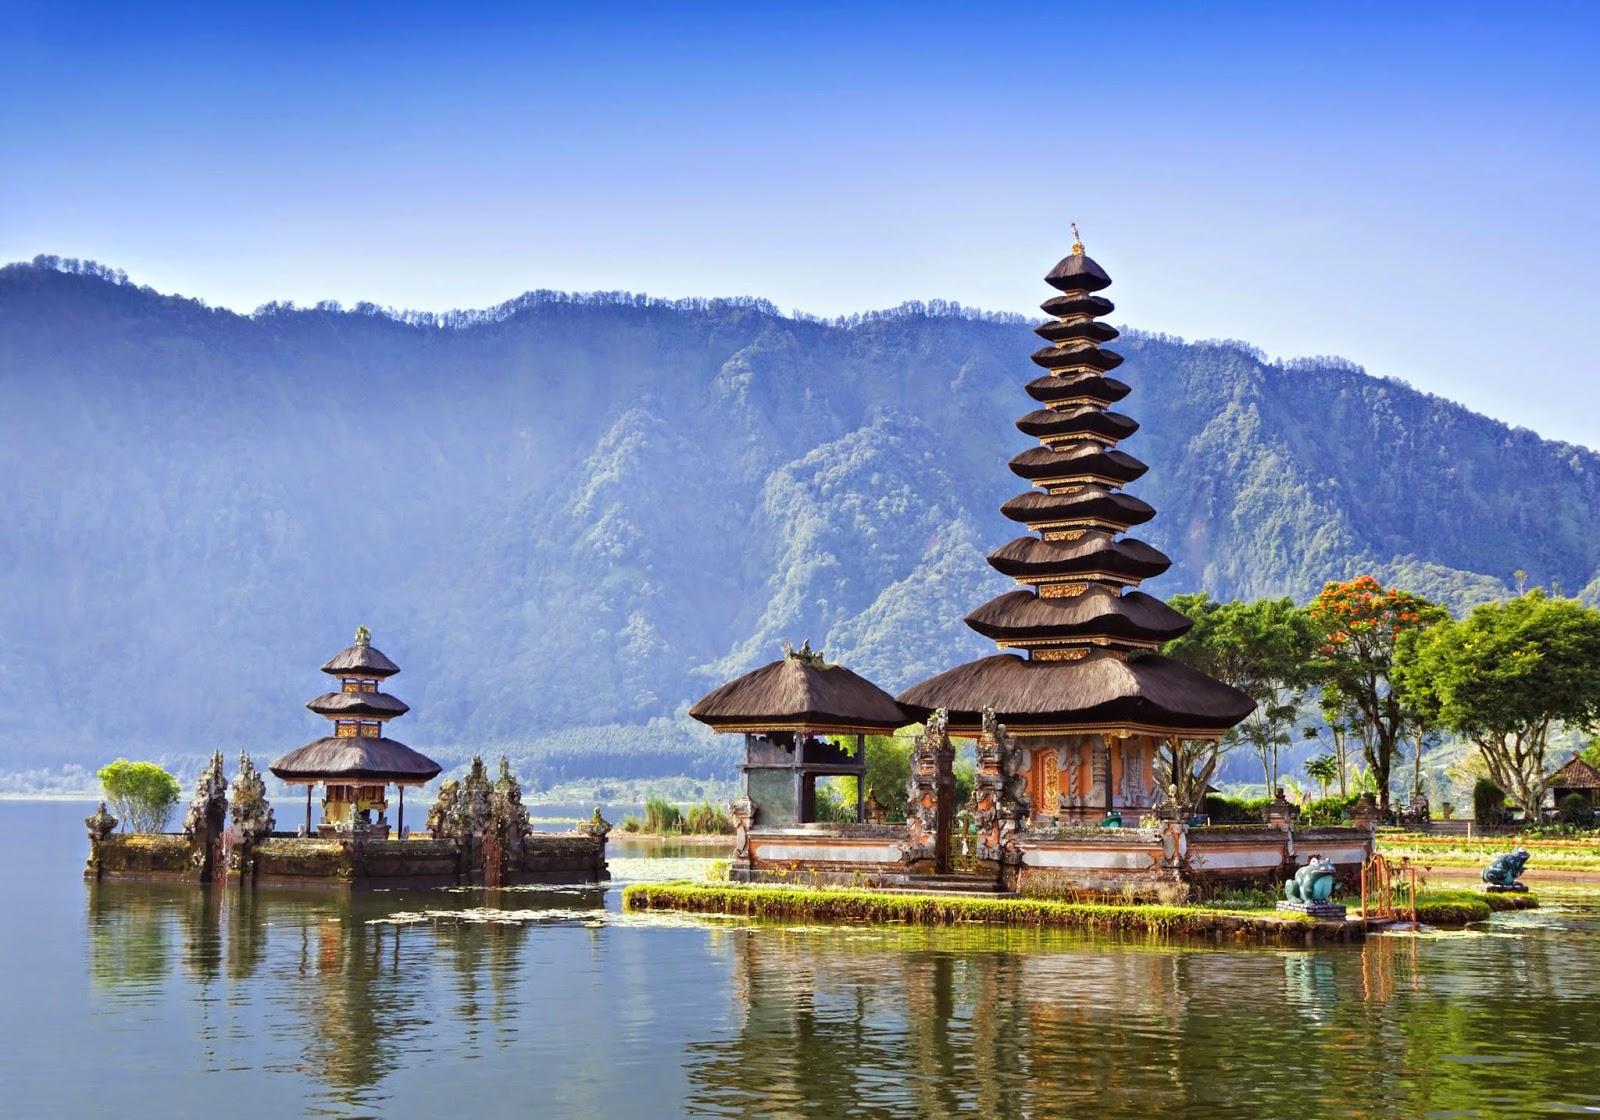 Objek Wisata Pulau Dewata Bali Tempat Wisata Indonesia